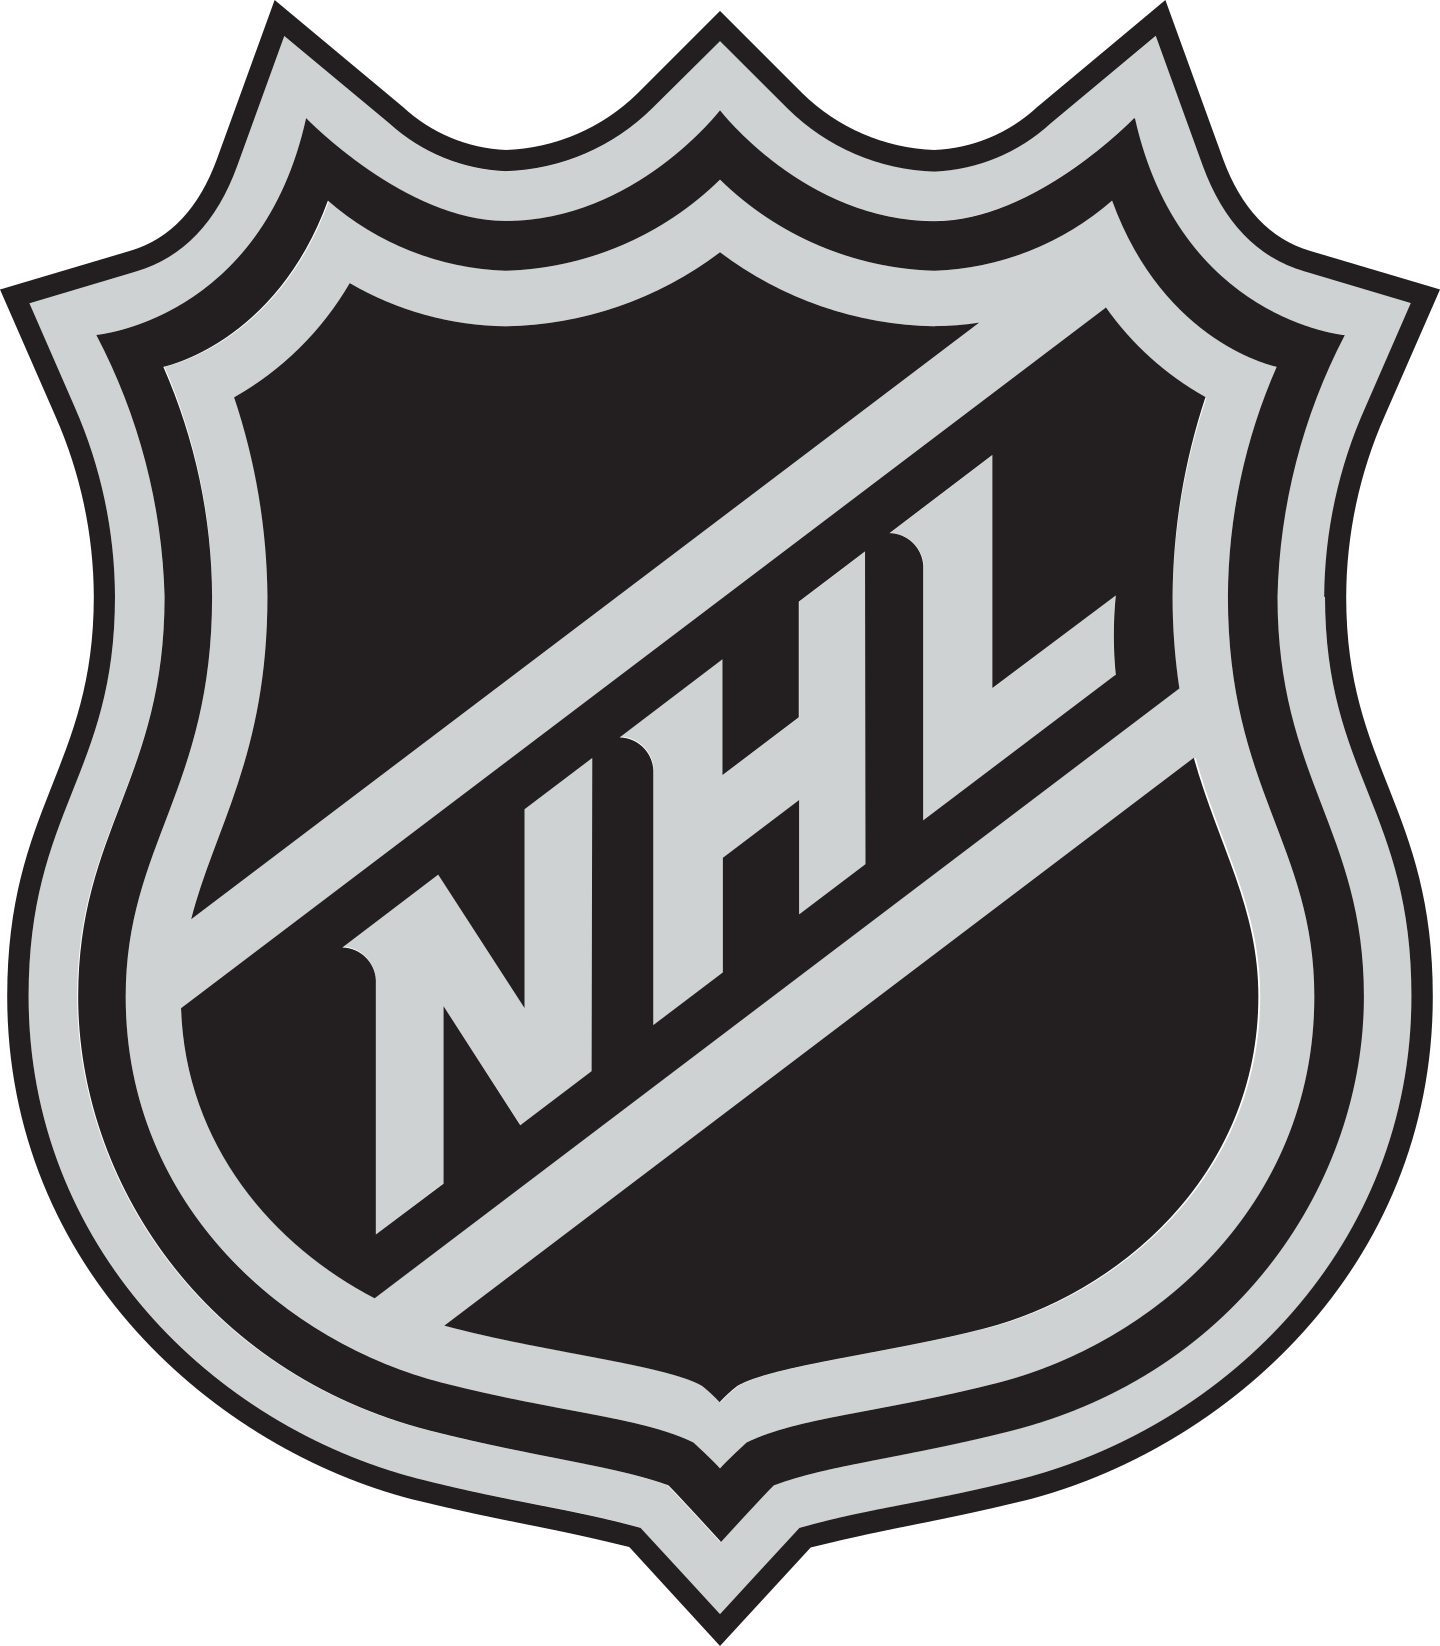 nhl logo 2 - NHL Logo - National Hockey League Logo